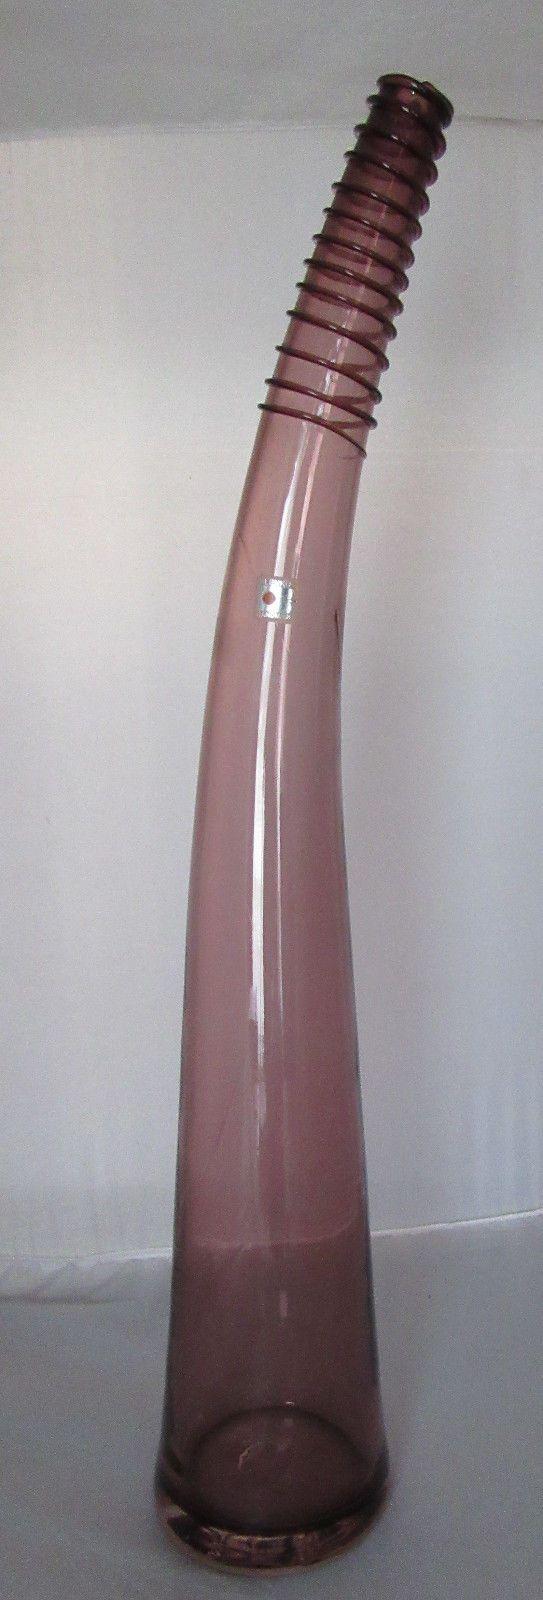 Best 25 tall floor vases ideas on pinterest large floral vintage amethyst blenko curved ribbed bottle neck floor vase 26 tall heavy reviewsmspy